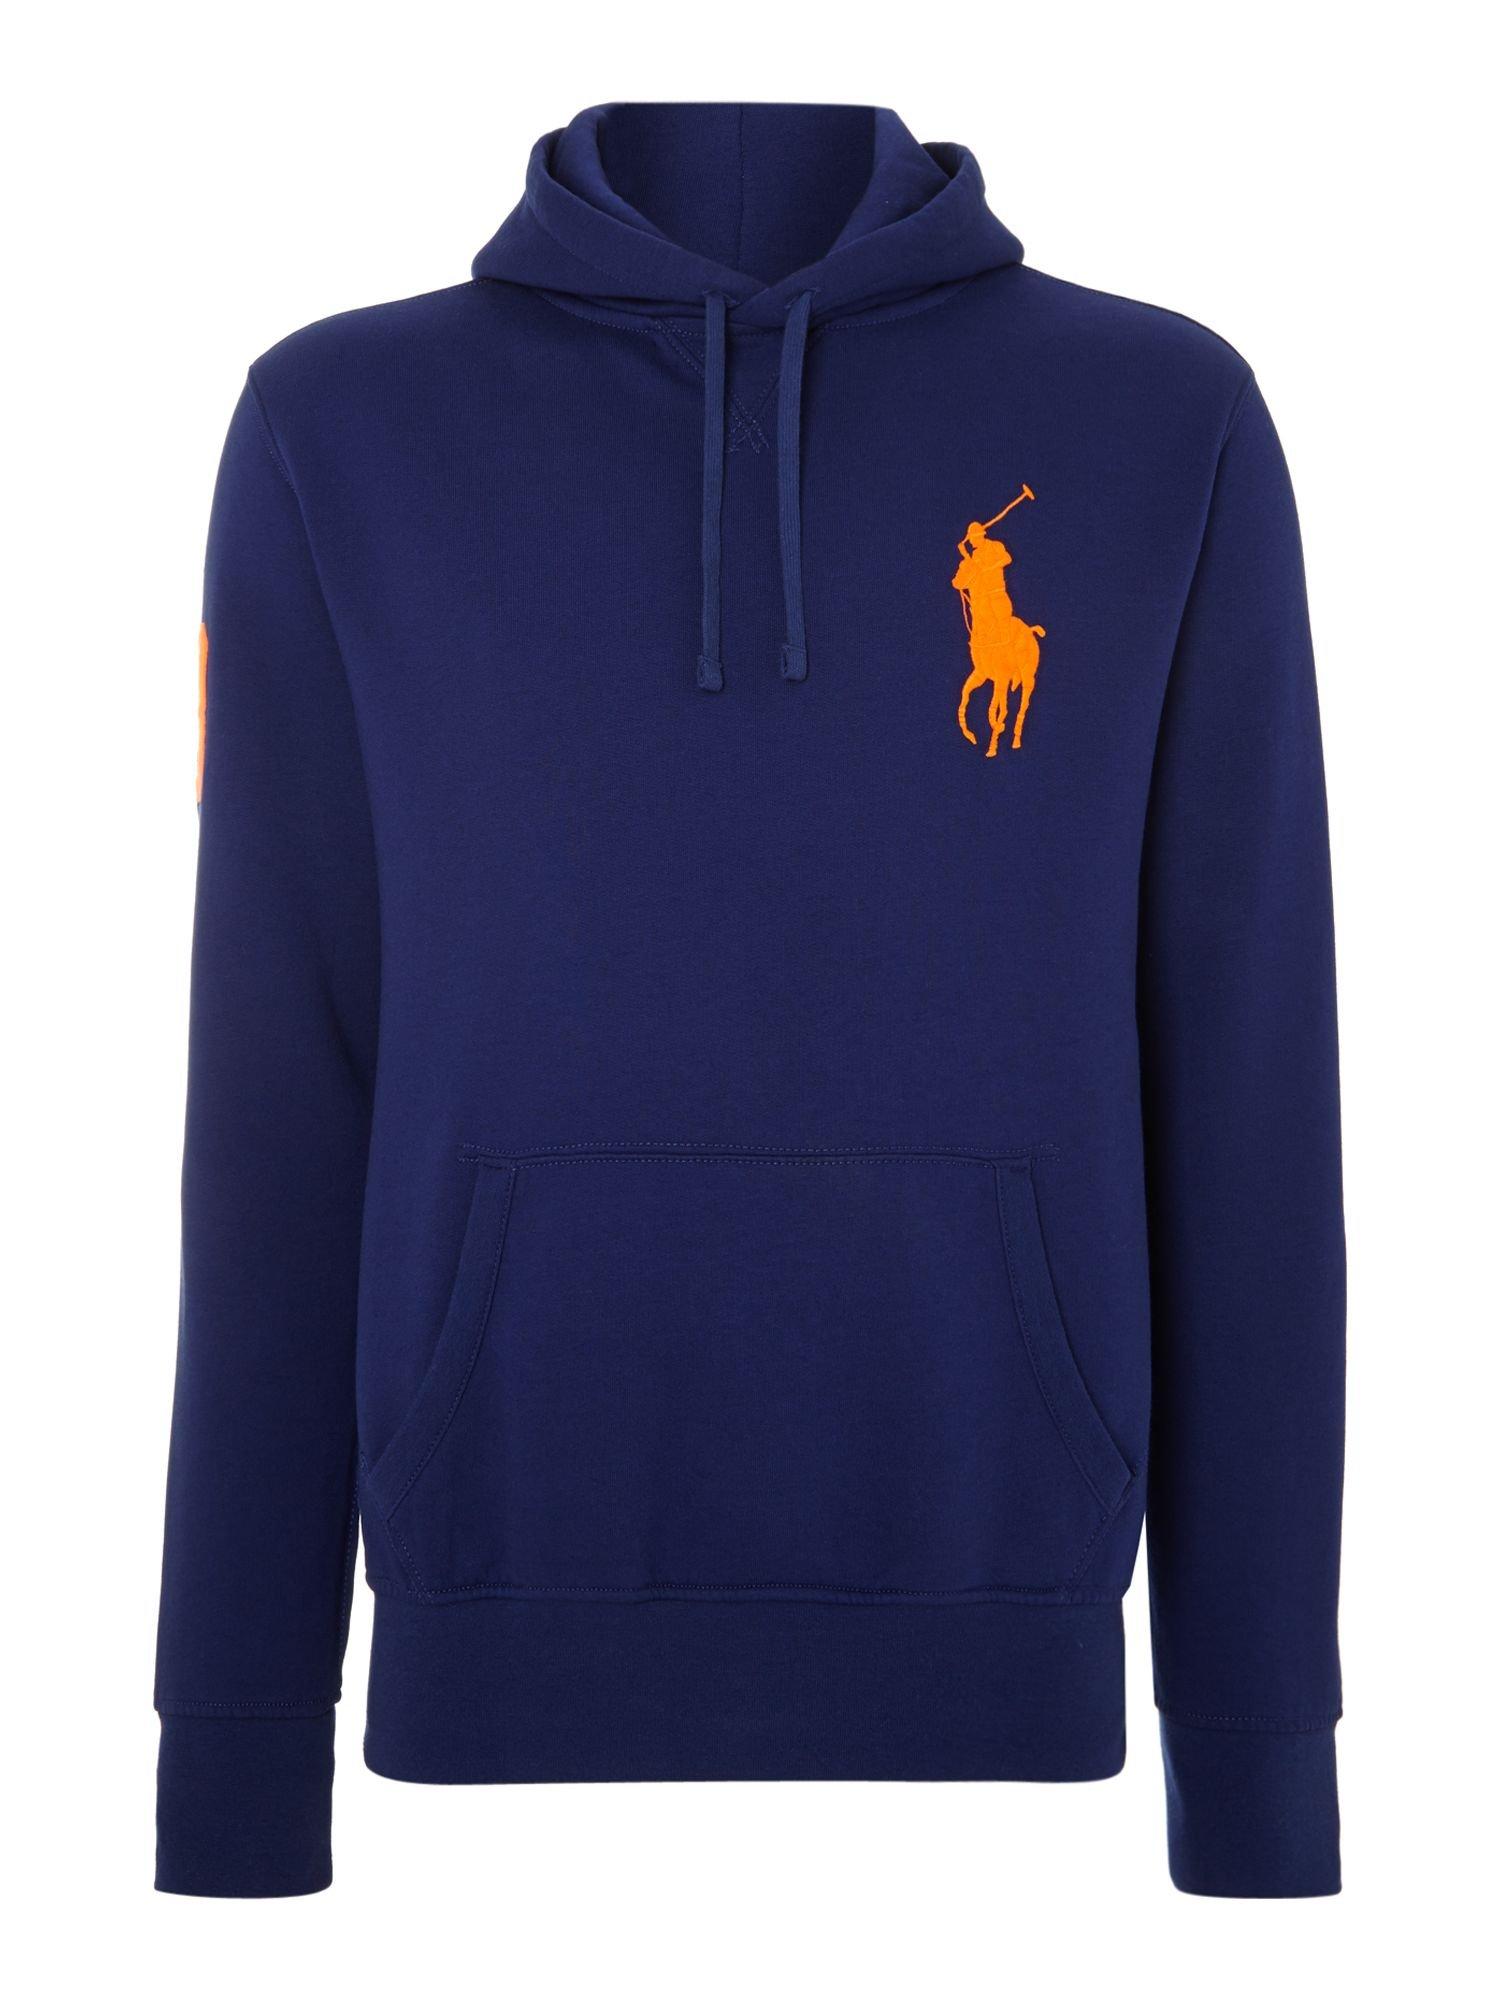 polo ralph lauren big pony player fleece hooded sweatshirt in blue for men lyst. Black Bedroom Furniture Sets. Home Design Ideas